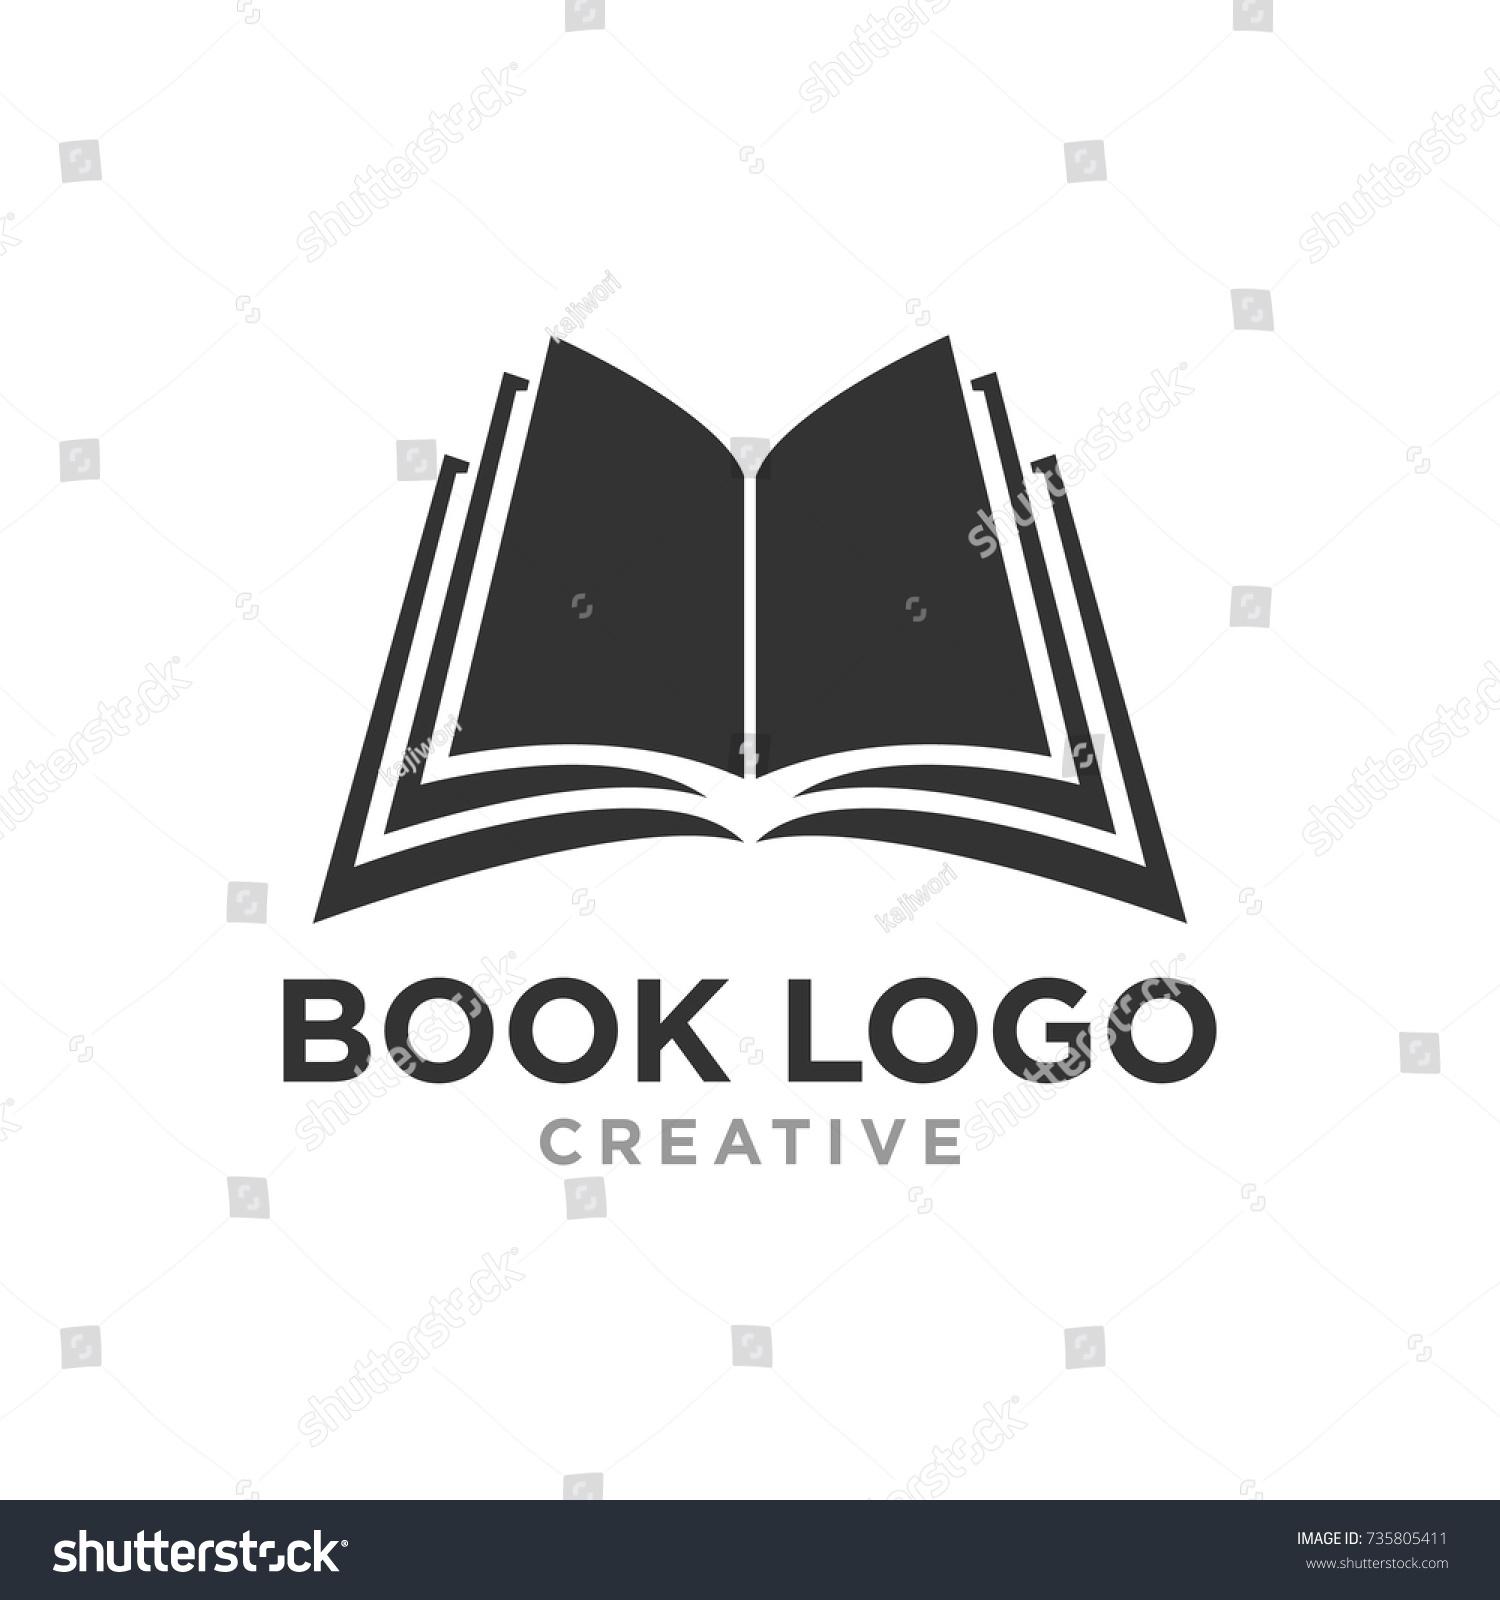 Creative Book Logo Design : Logo design book clever logos with hidden symbolism